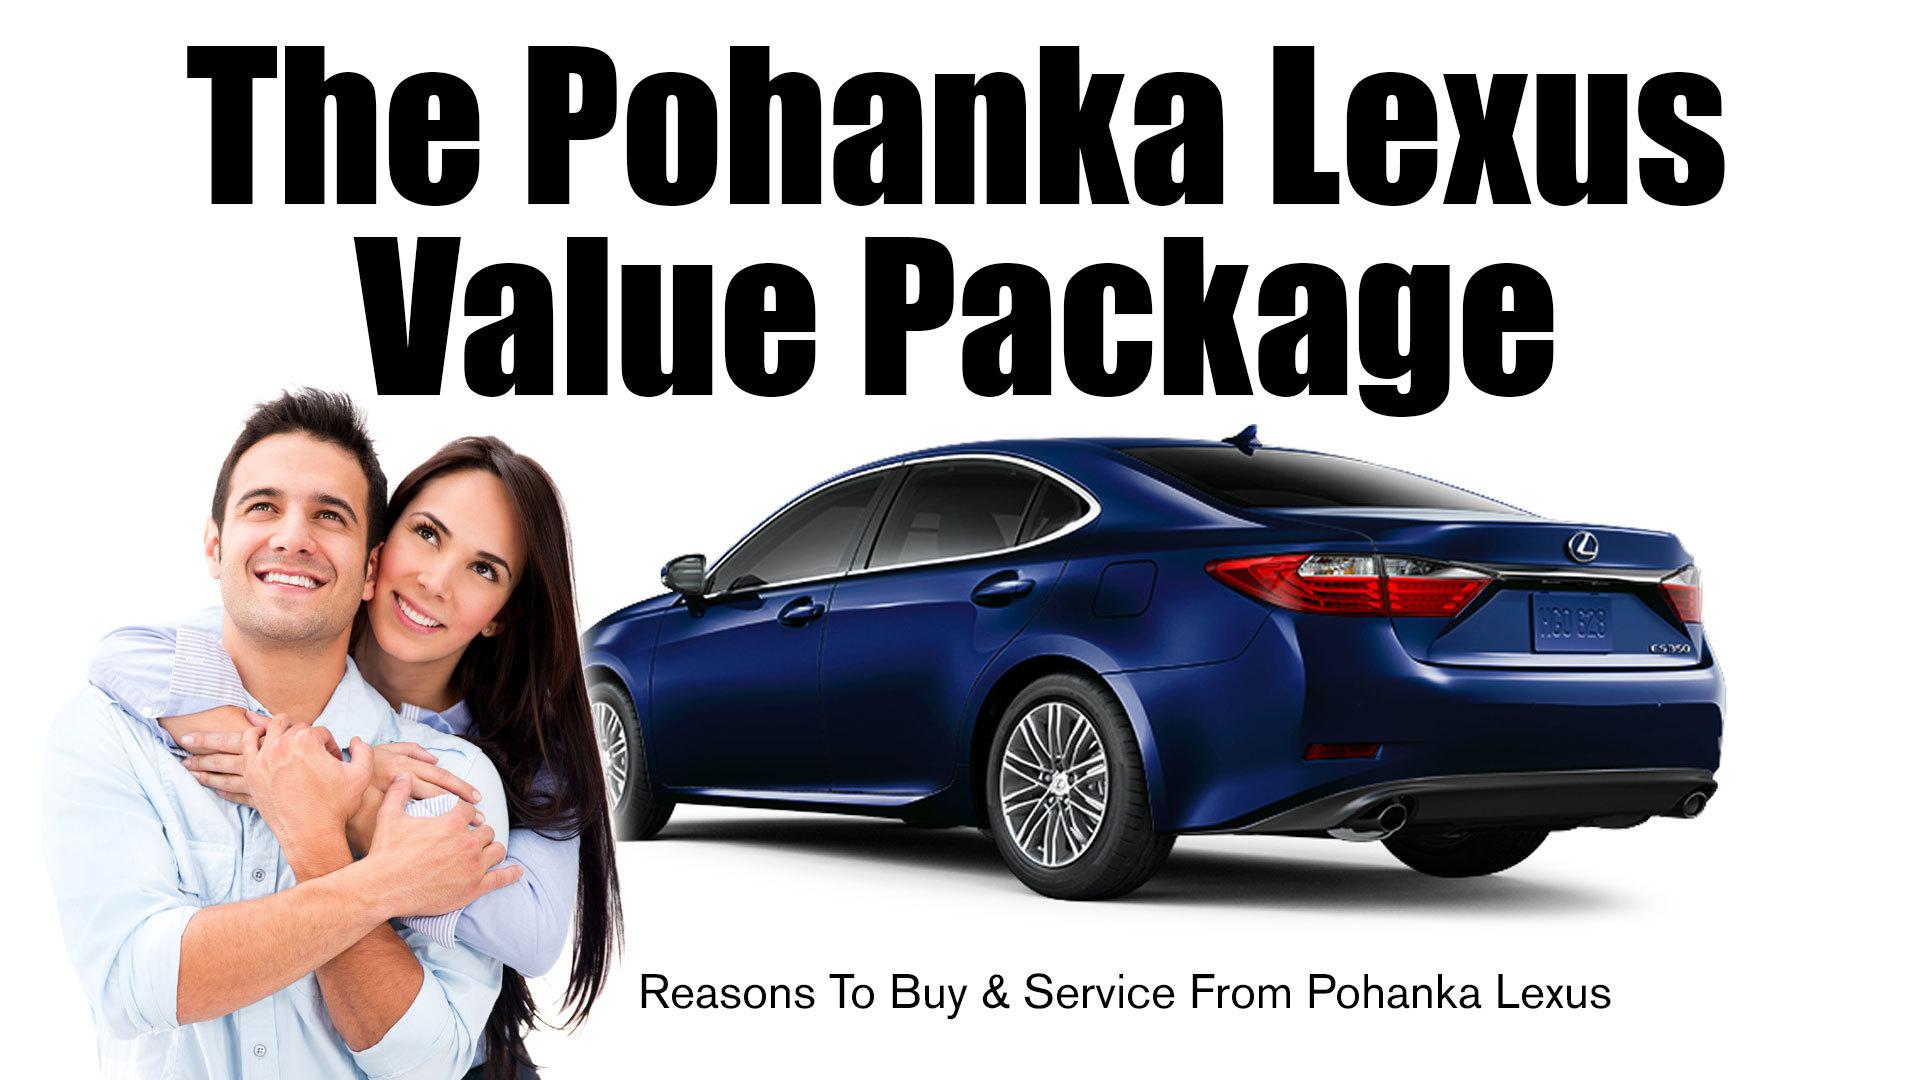 Pohanka lexus service coupon